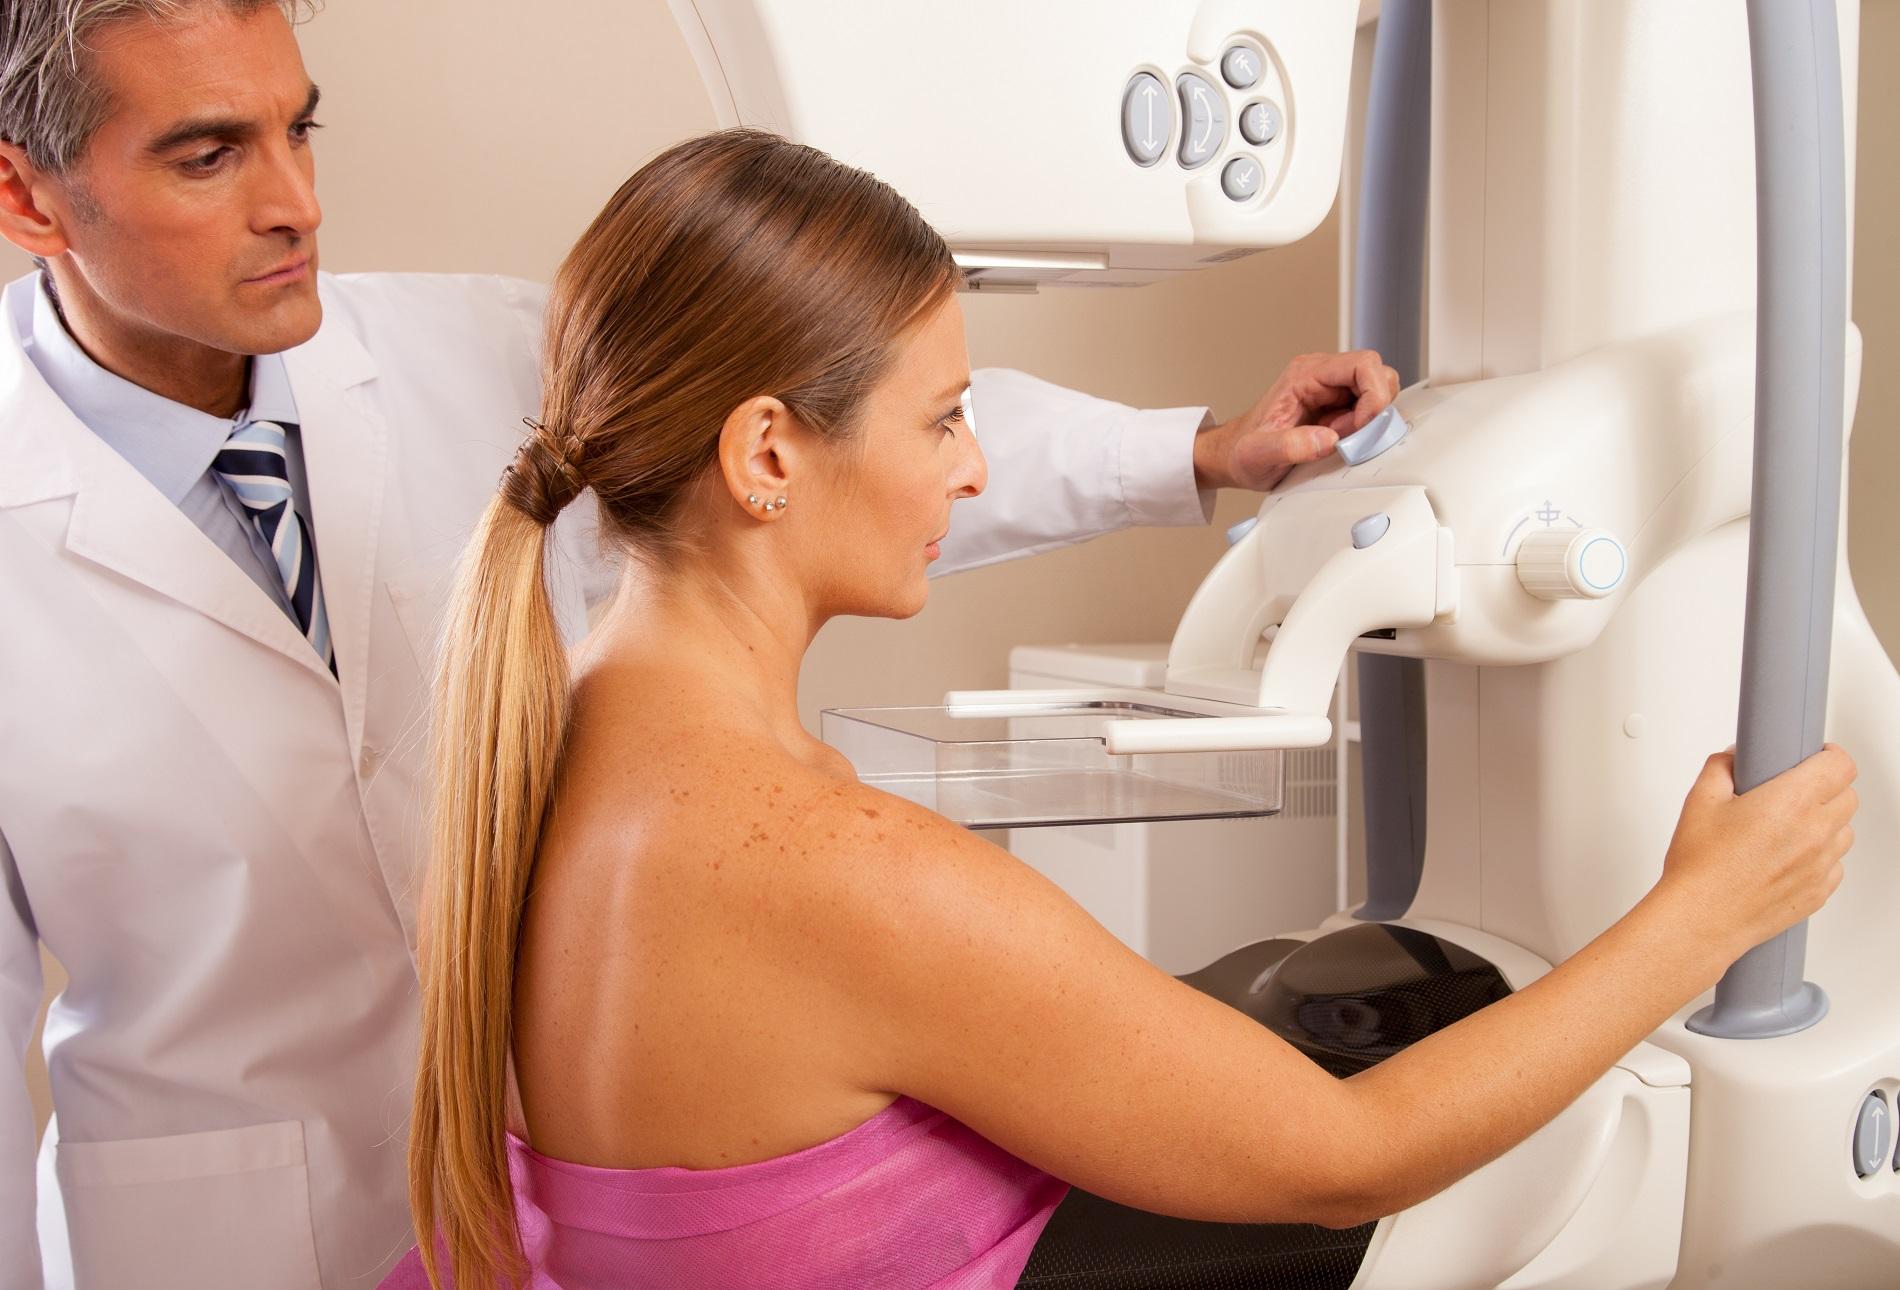 Rak piersi – na czym polega nowoczesna profilaktyka?